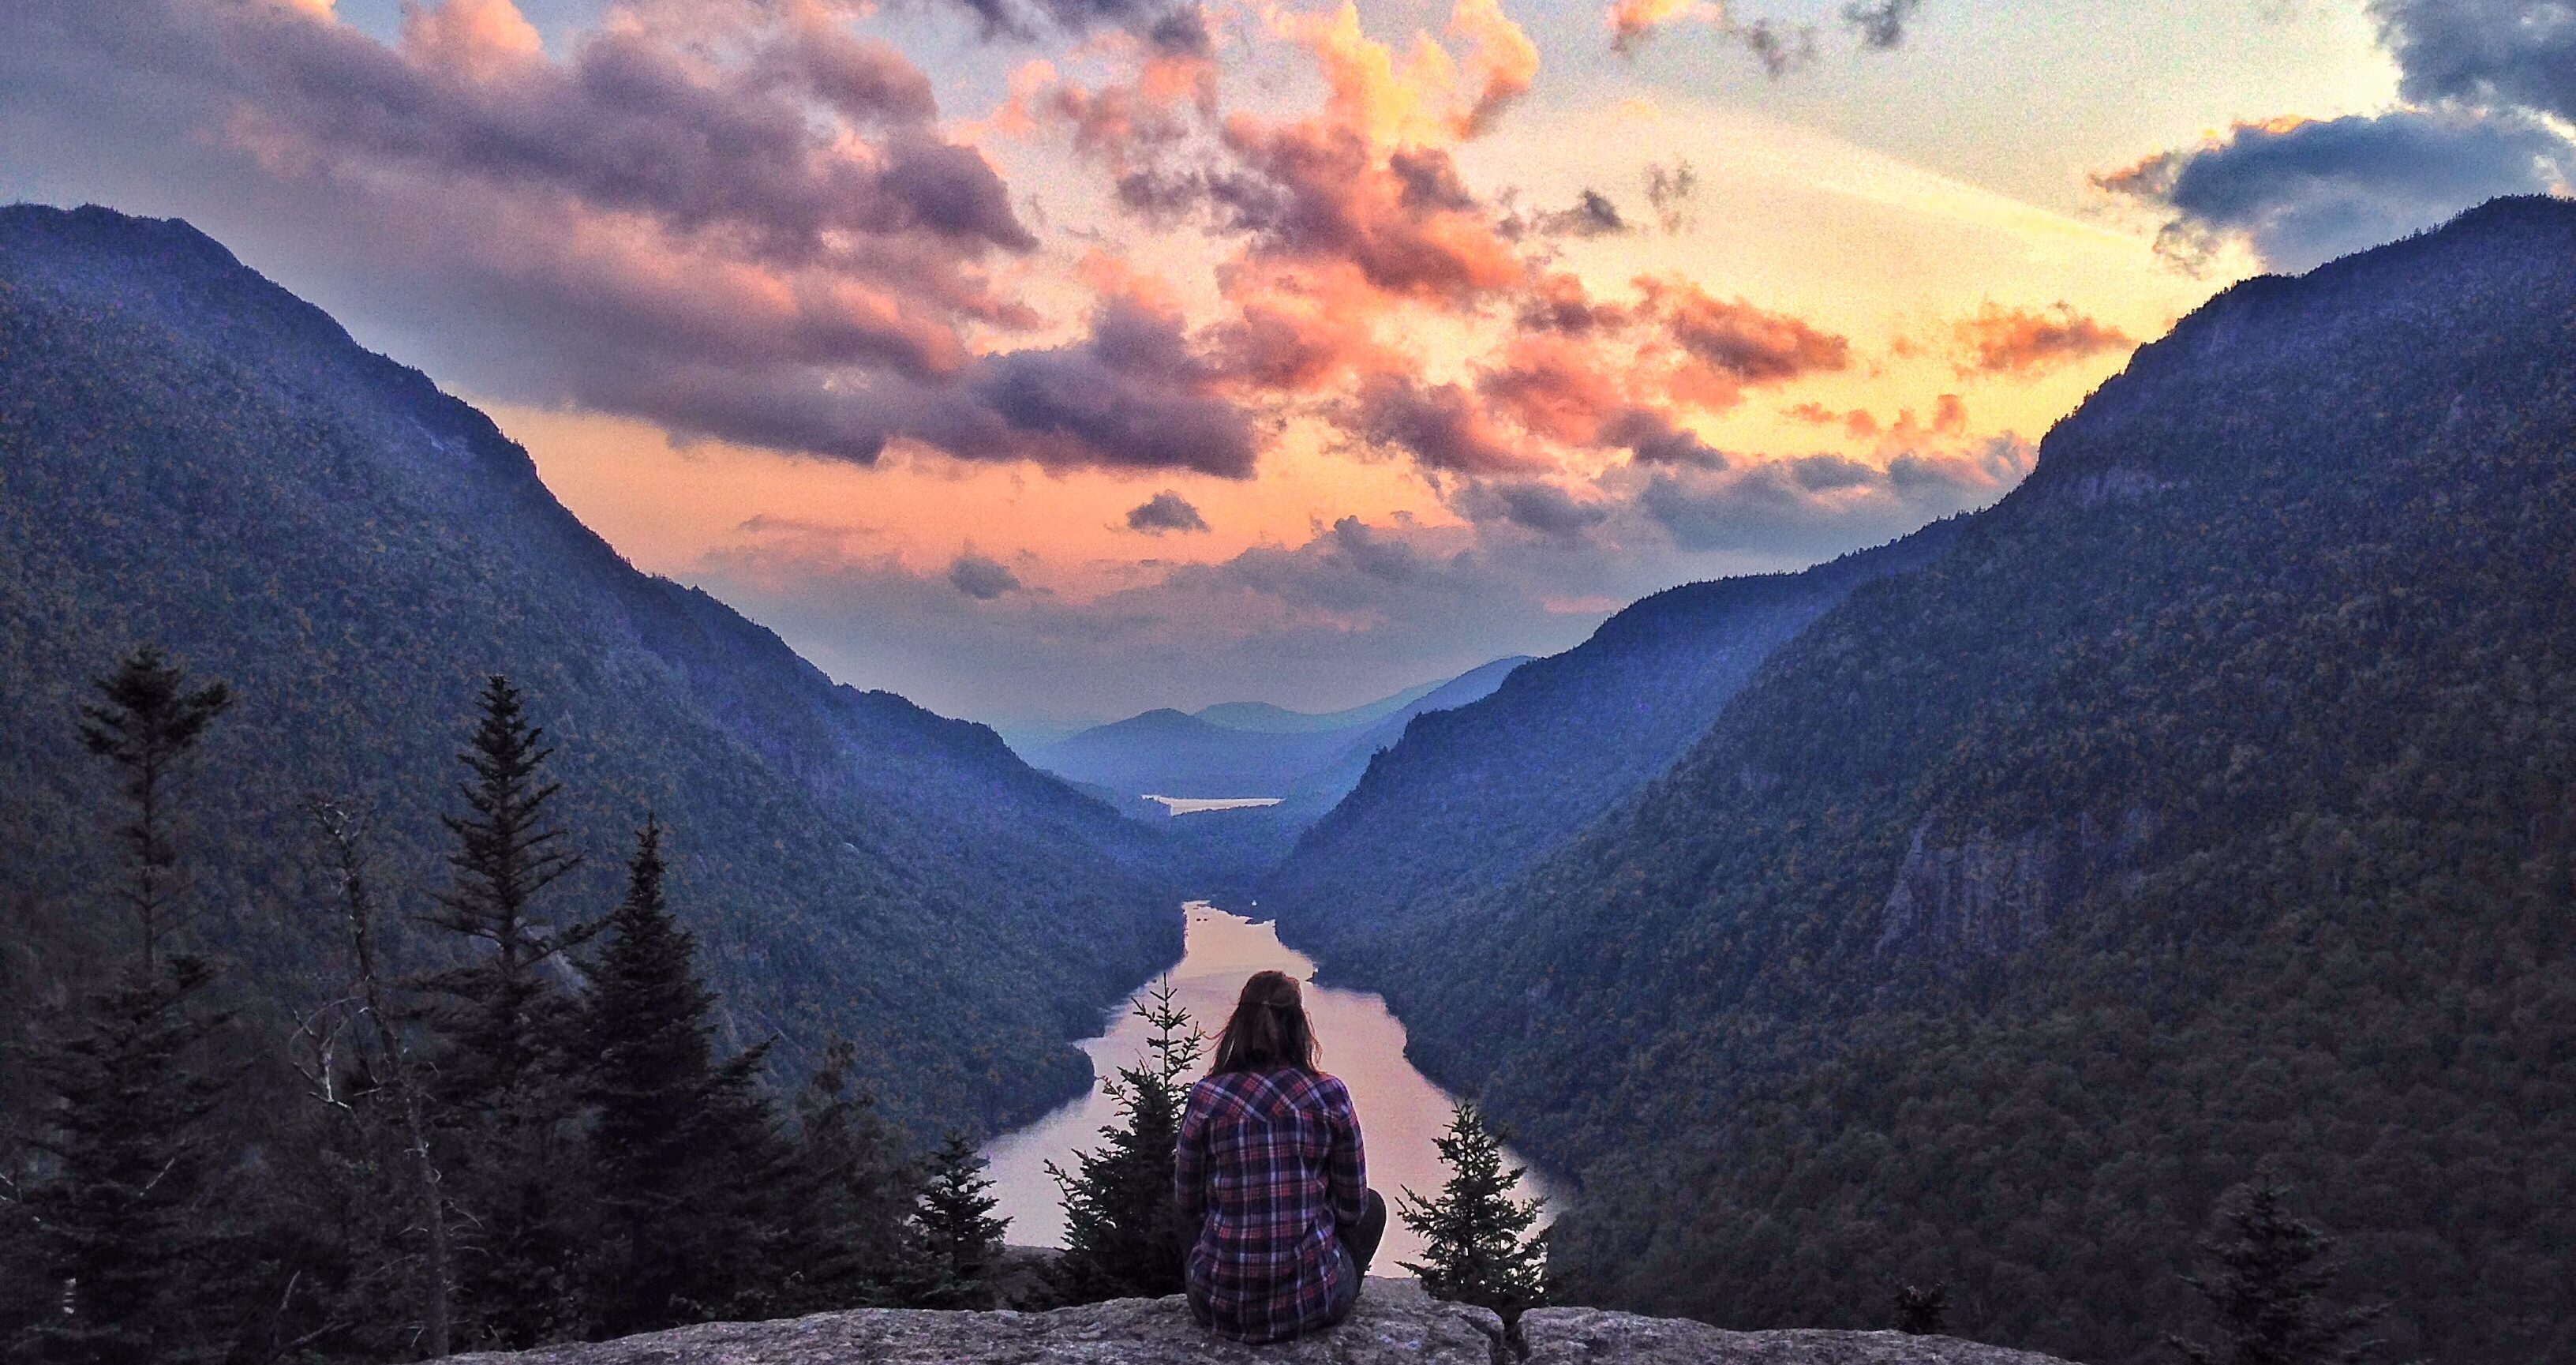 Adirondack Fall Wallpaper Indian Head Fjord Country In The Adirondacks Goeast